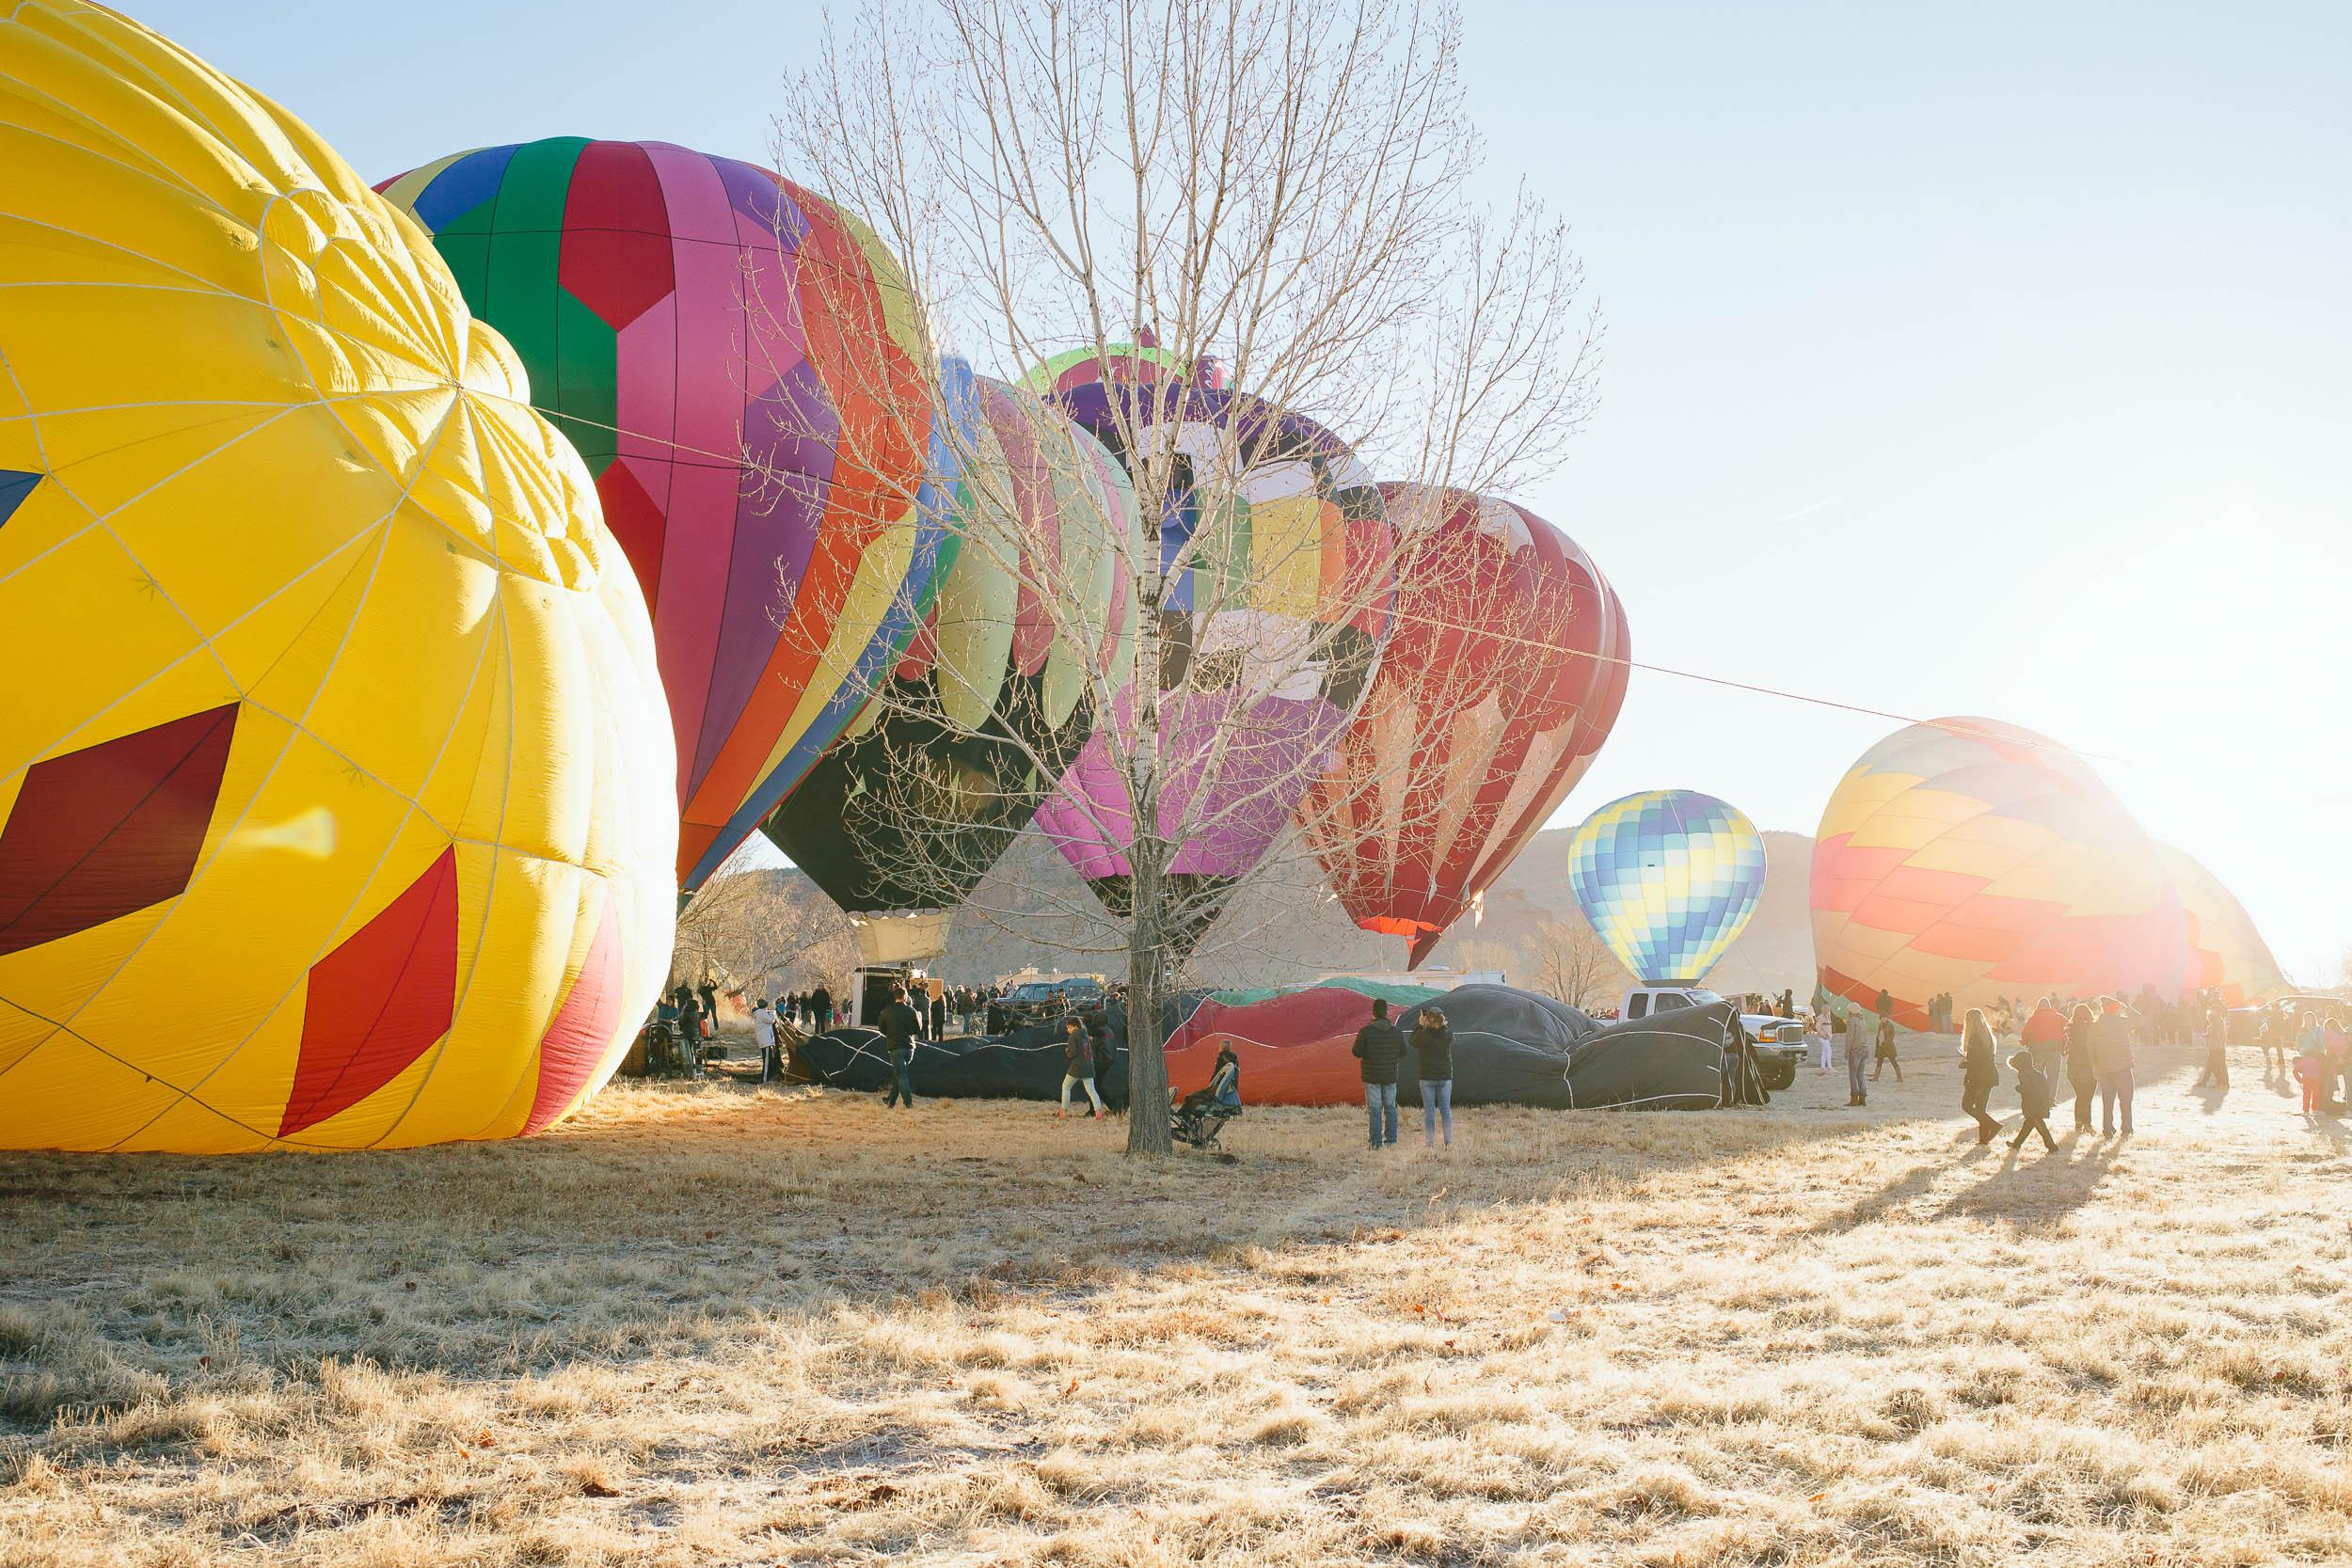 Kyle-Sheppard-Kanab-Balloon-Festival-5.jpg